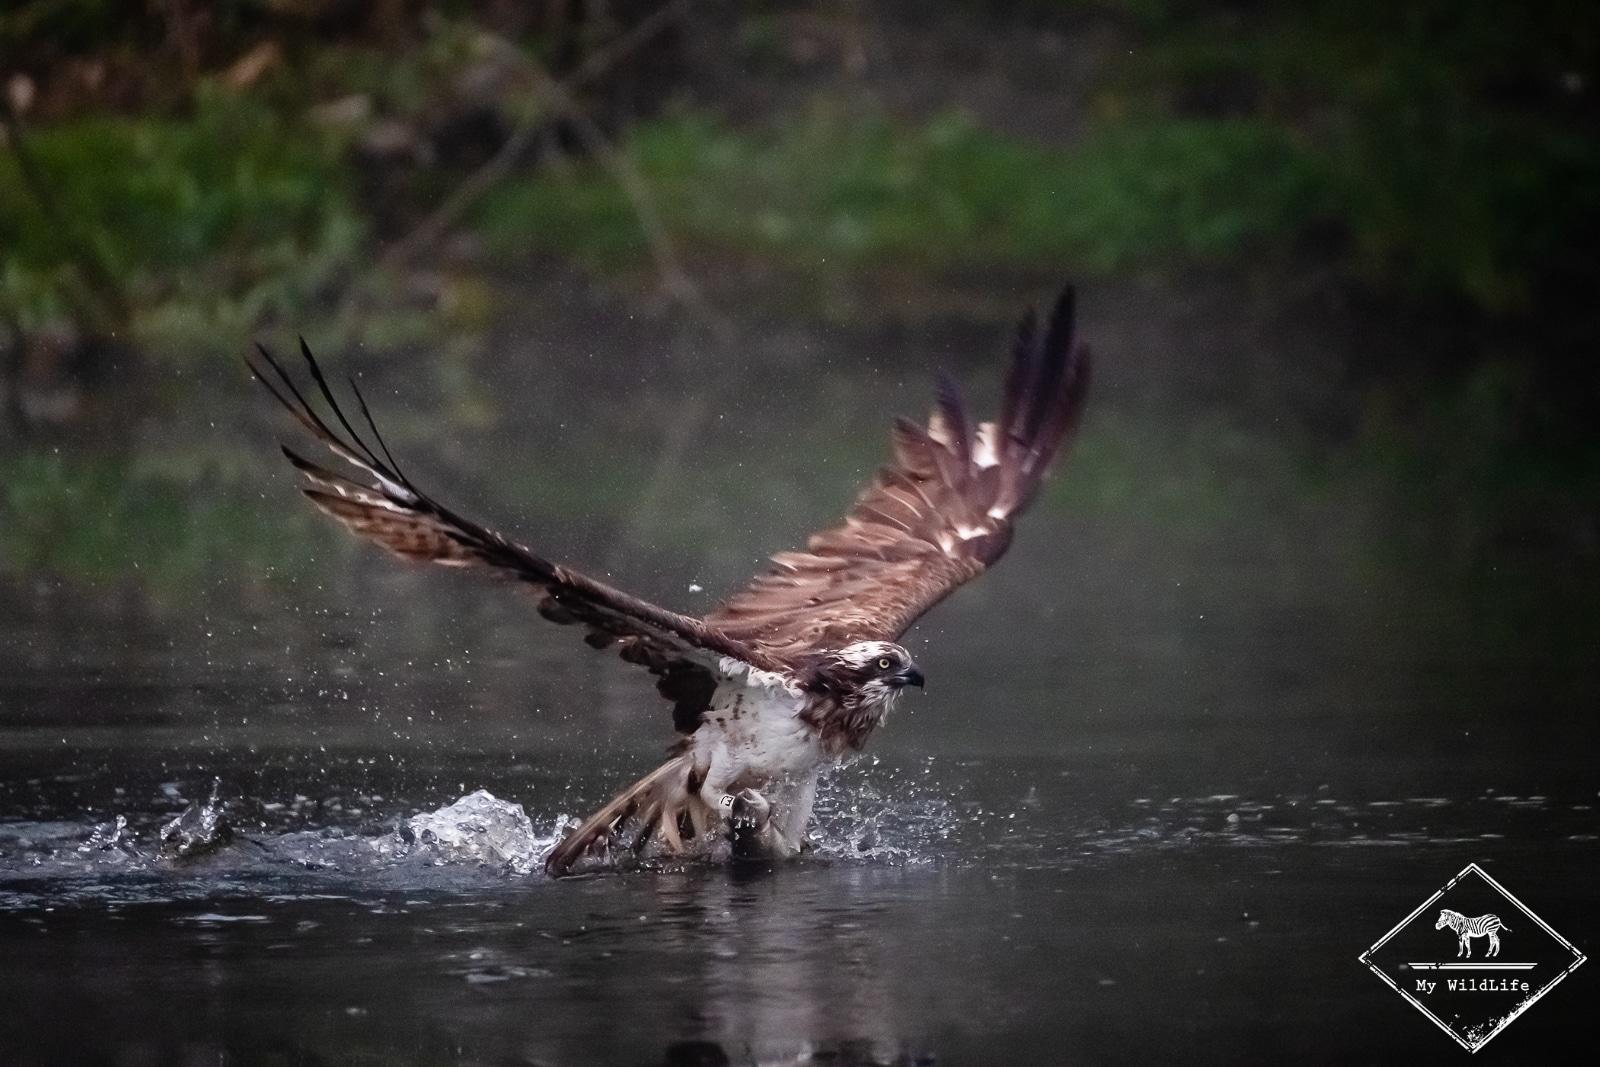 Balbuzard pêcheur, Voyage Photo Ornithologie en Ecosse